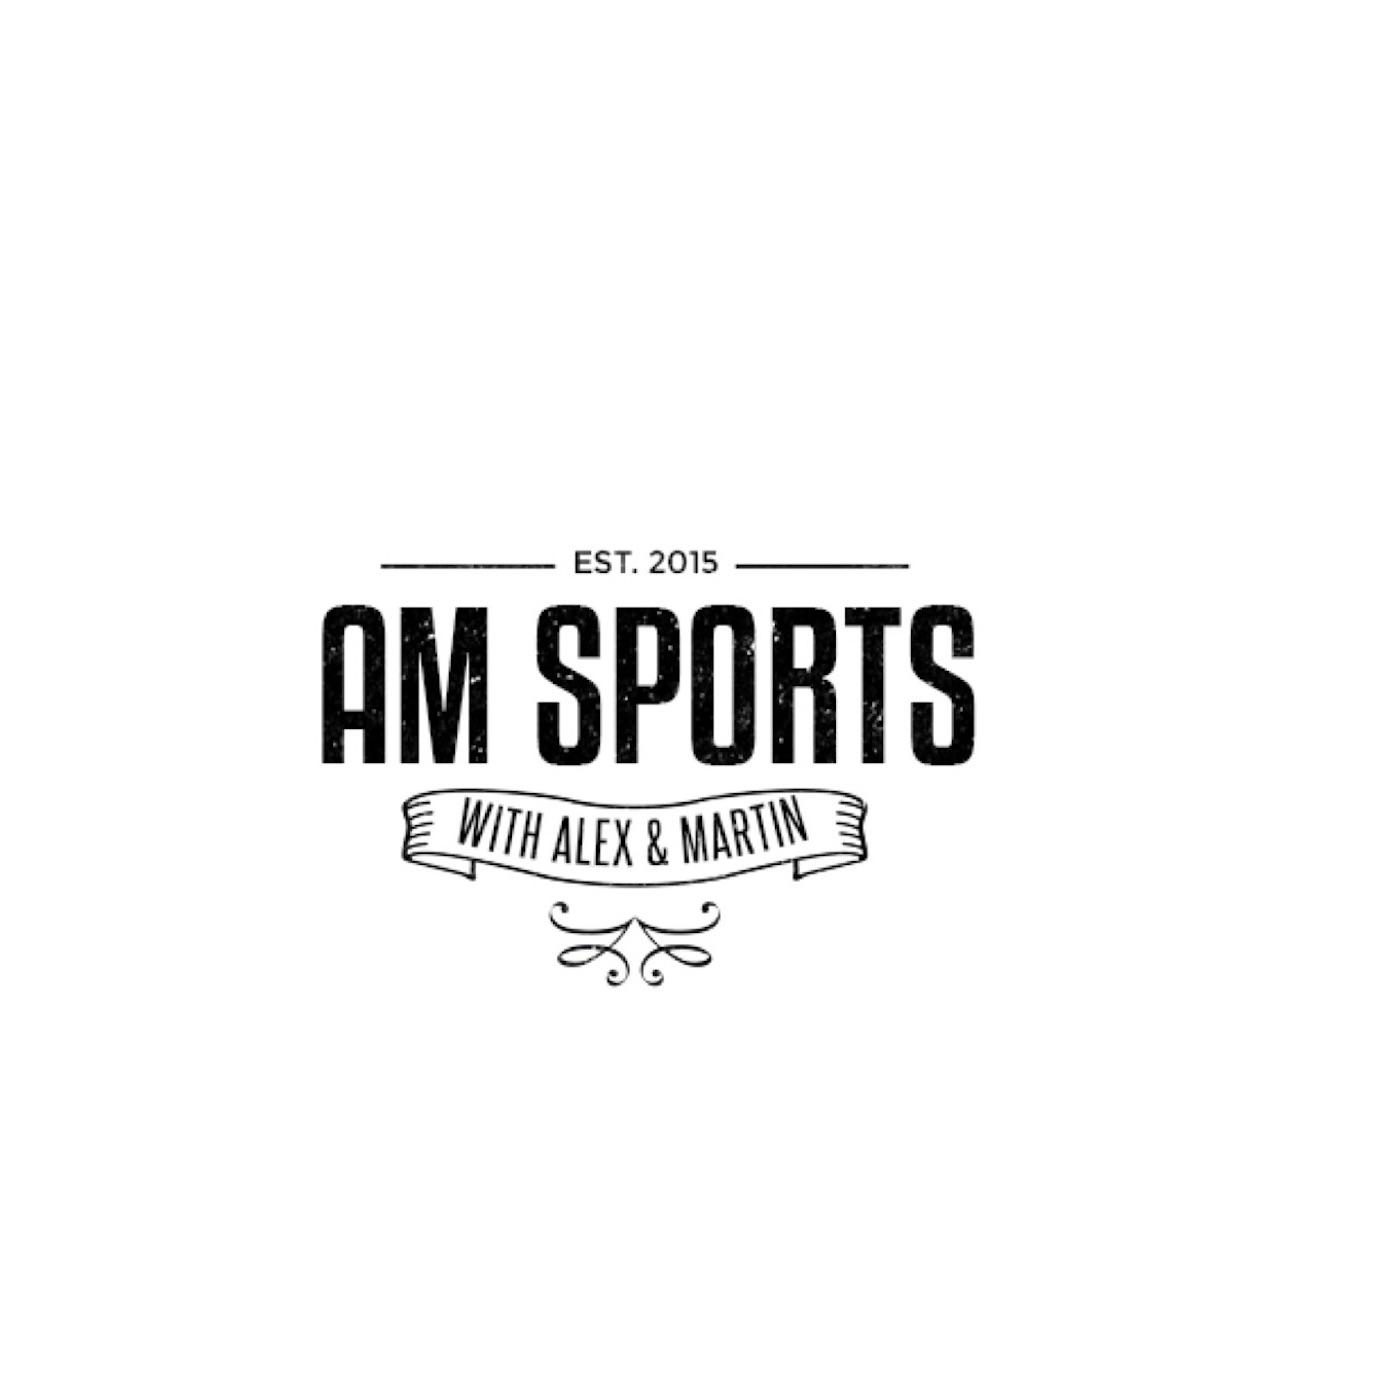 AM Sports with Alex & Martin